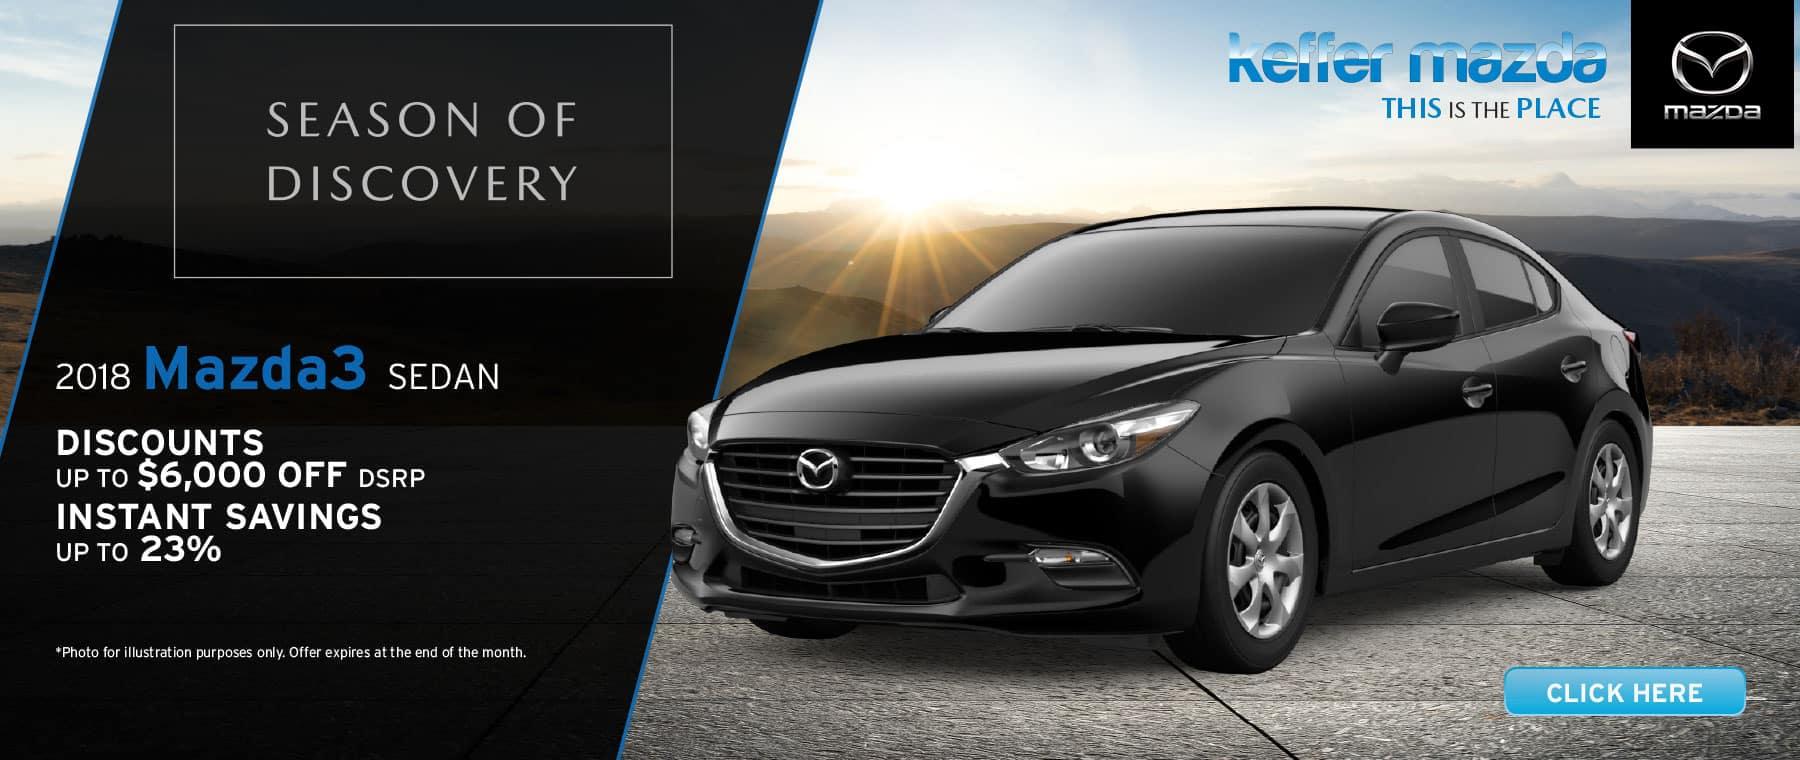 2018 Mazda3 Sedan Sport Saving up to 20%, restrictions may apply